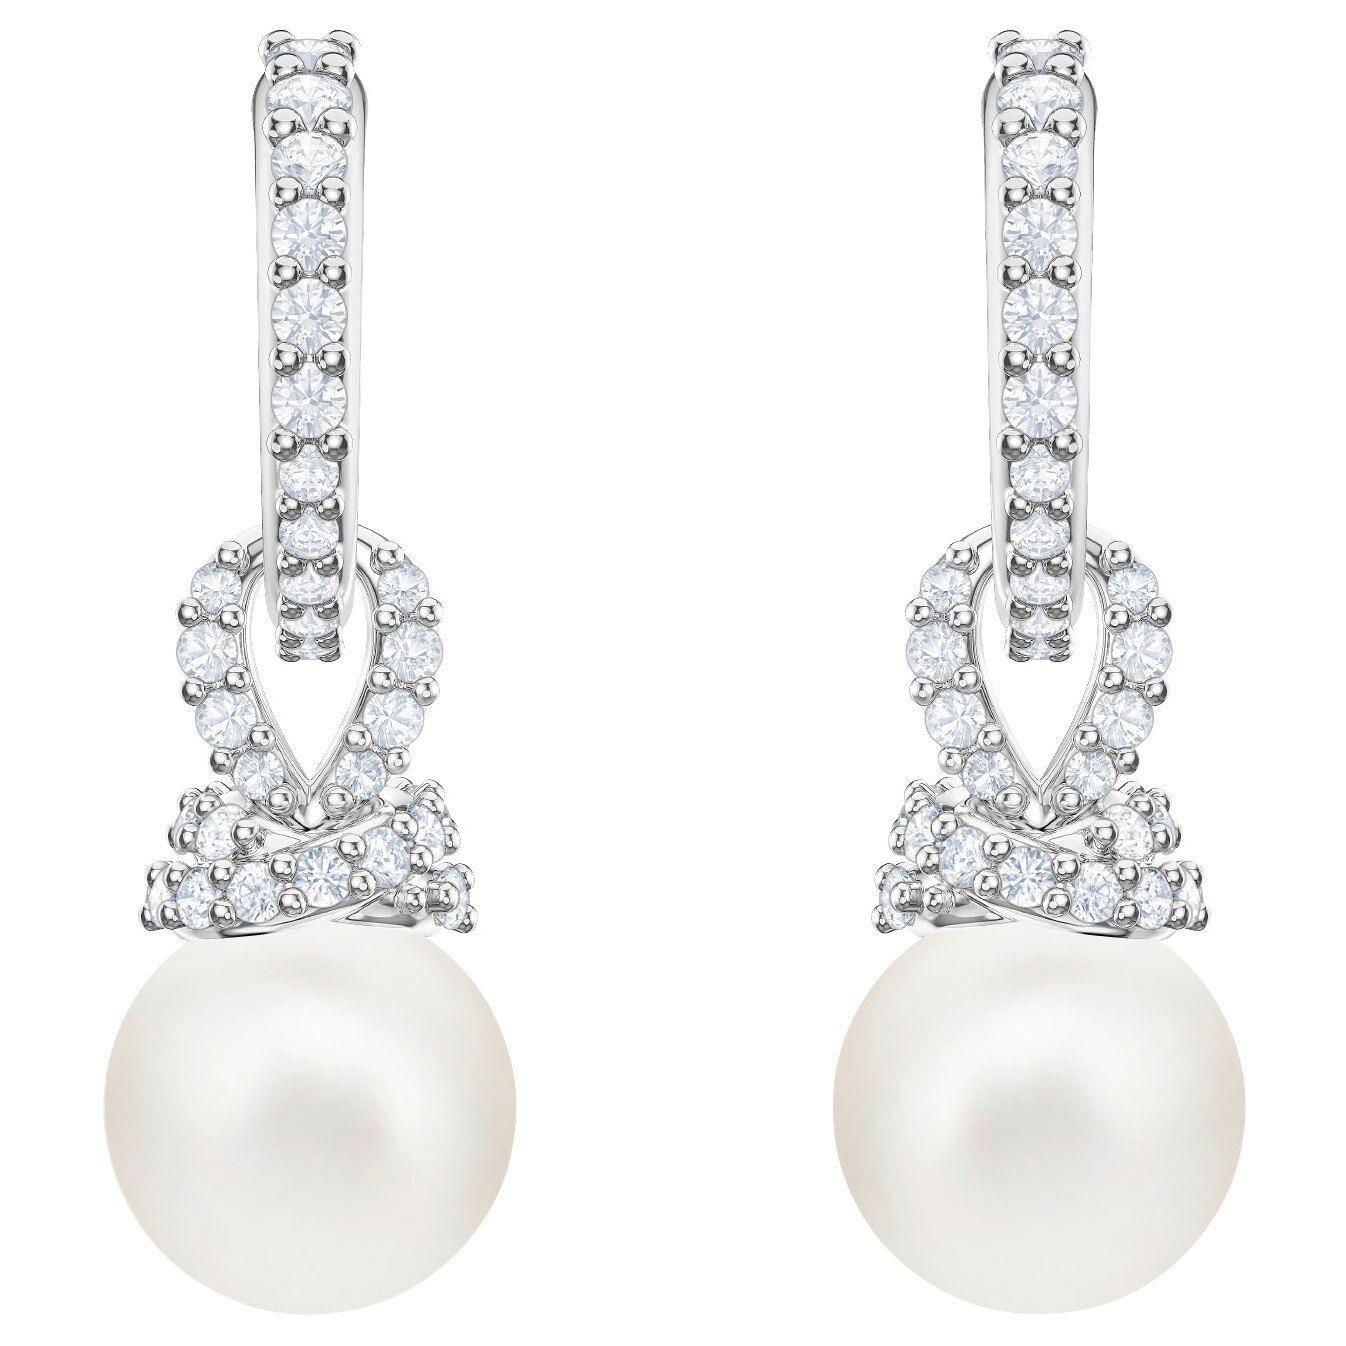 Swarovski 5461080 Originally Pierced Earrings, White, Rhodium Plating  RRP  149